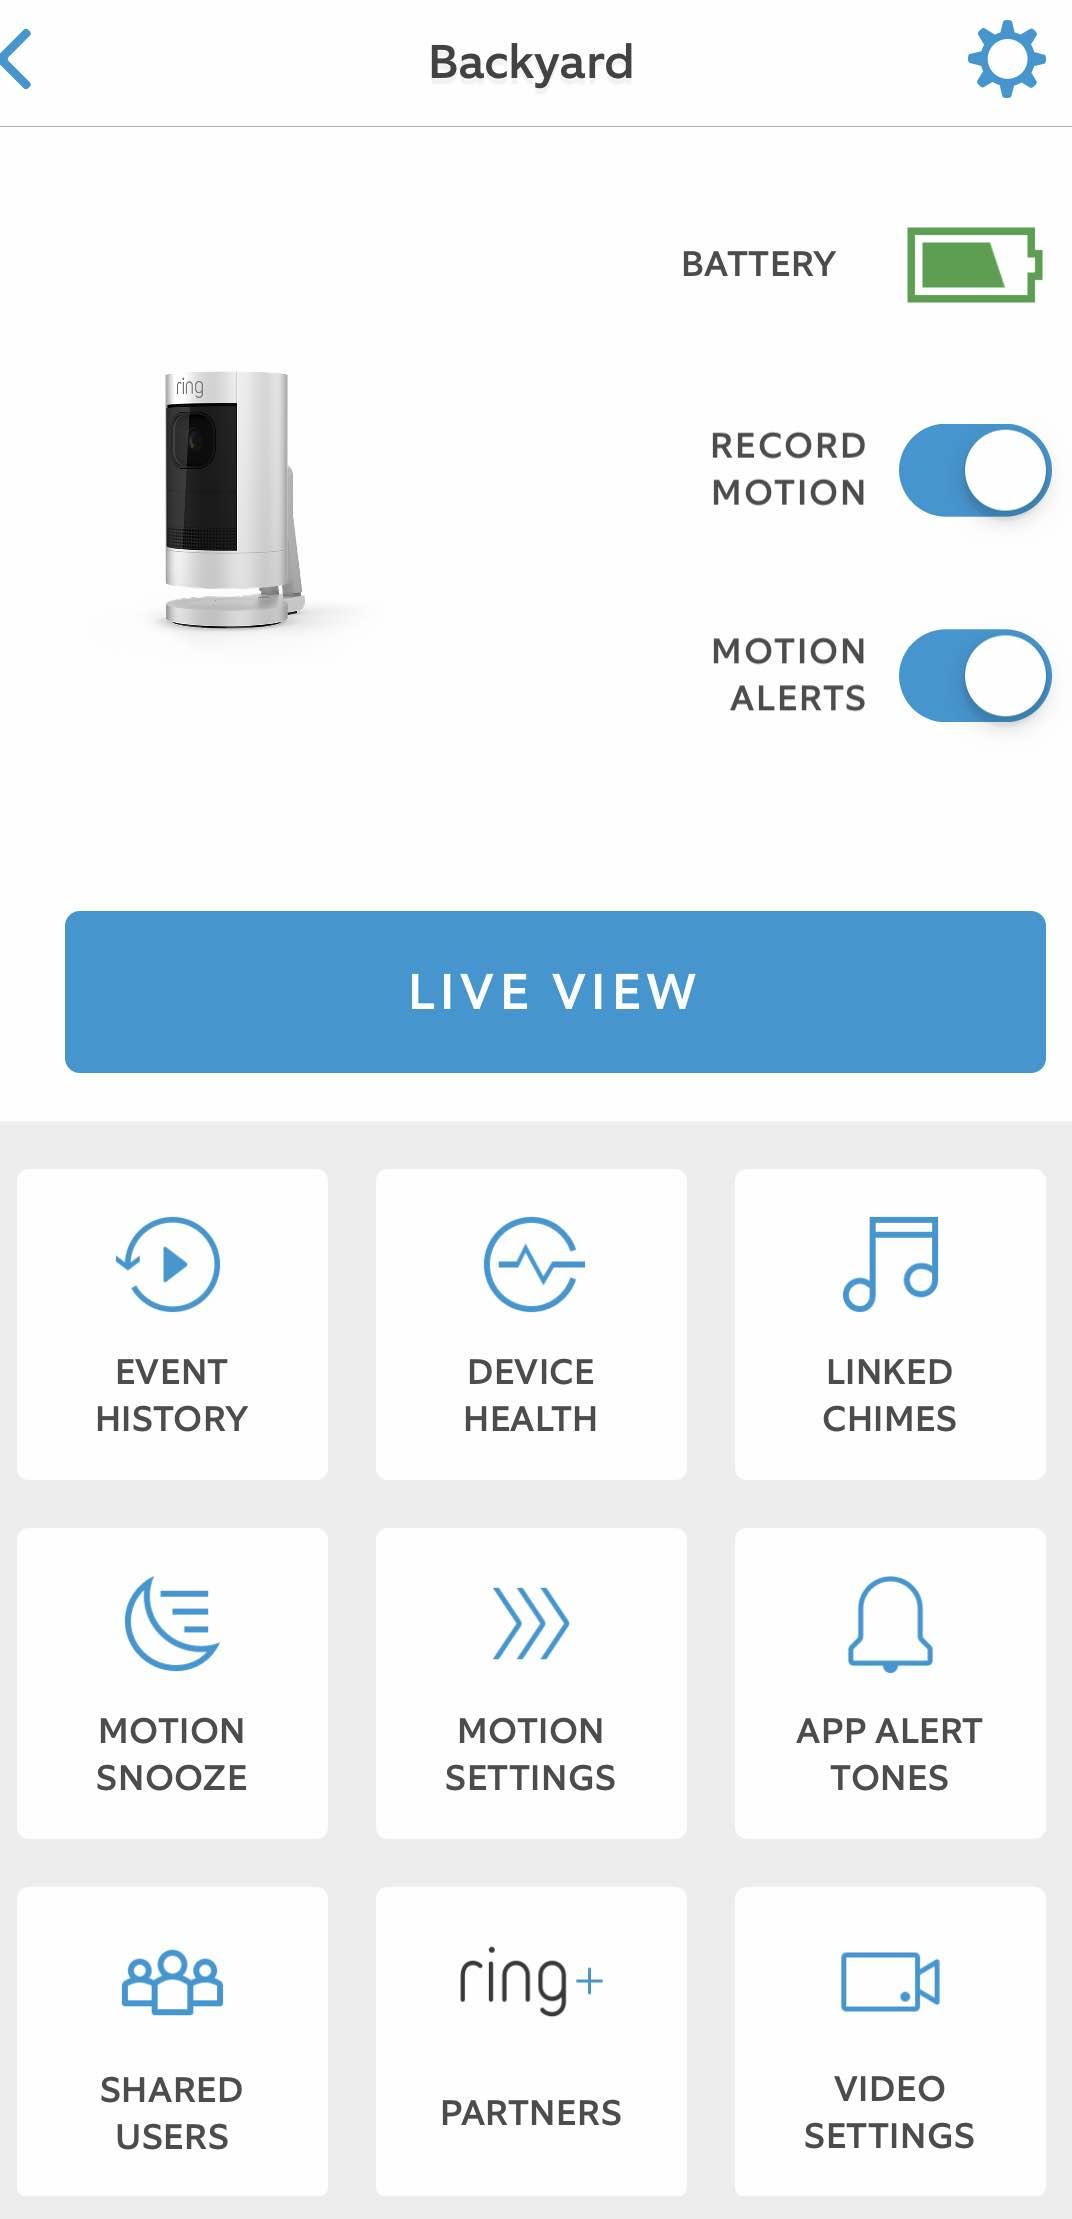 Ring Stick Up CAm app